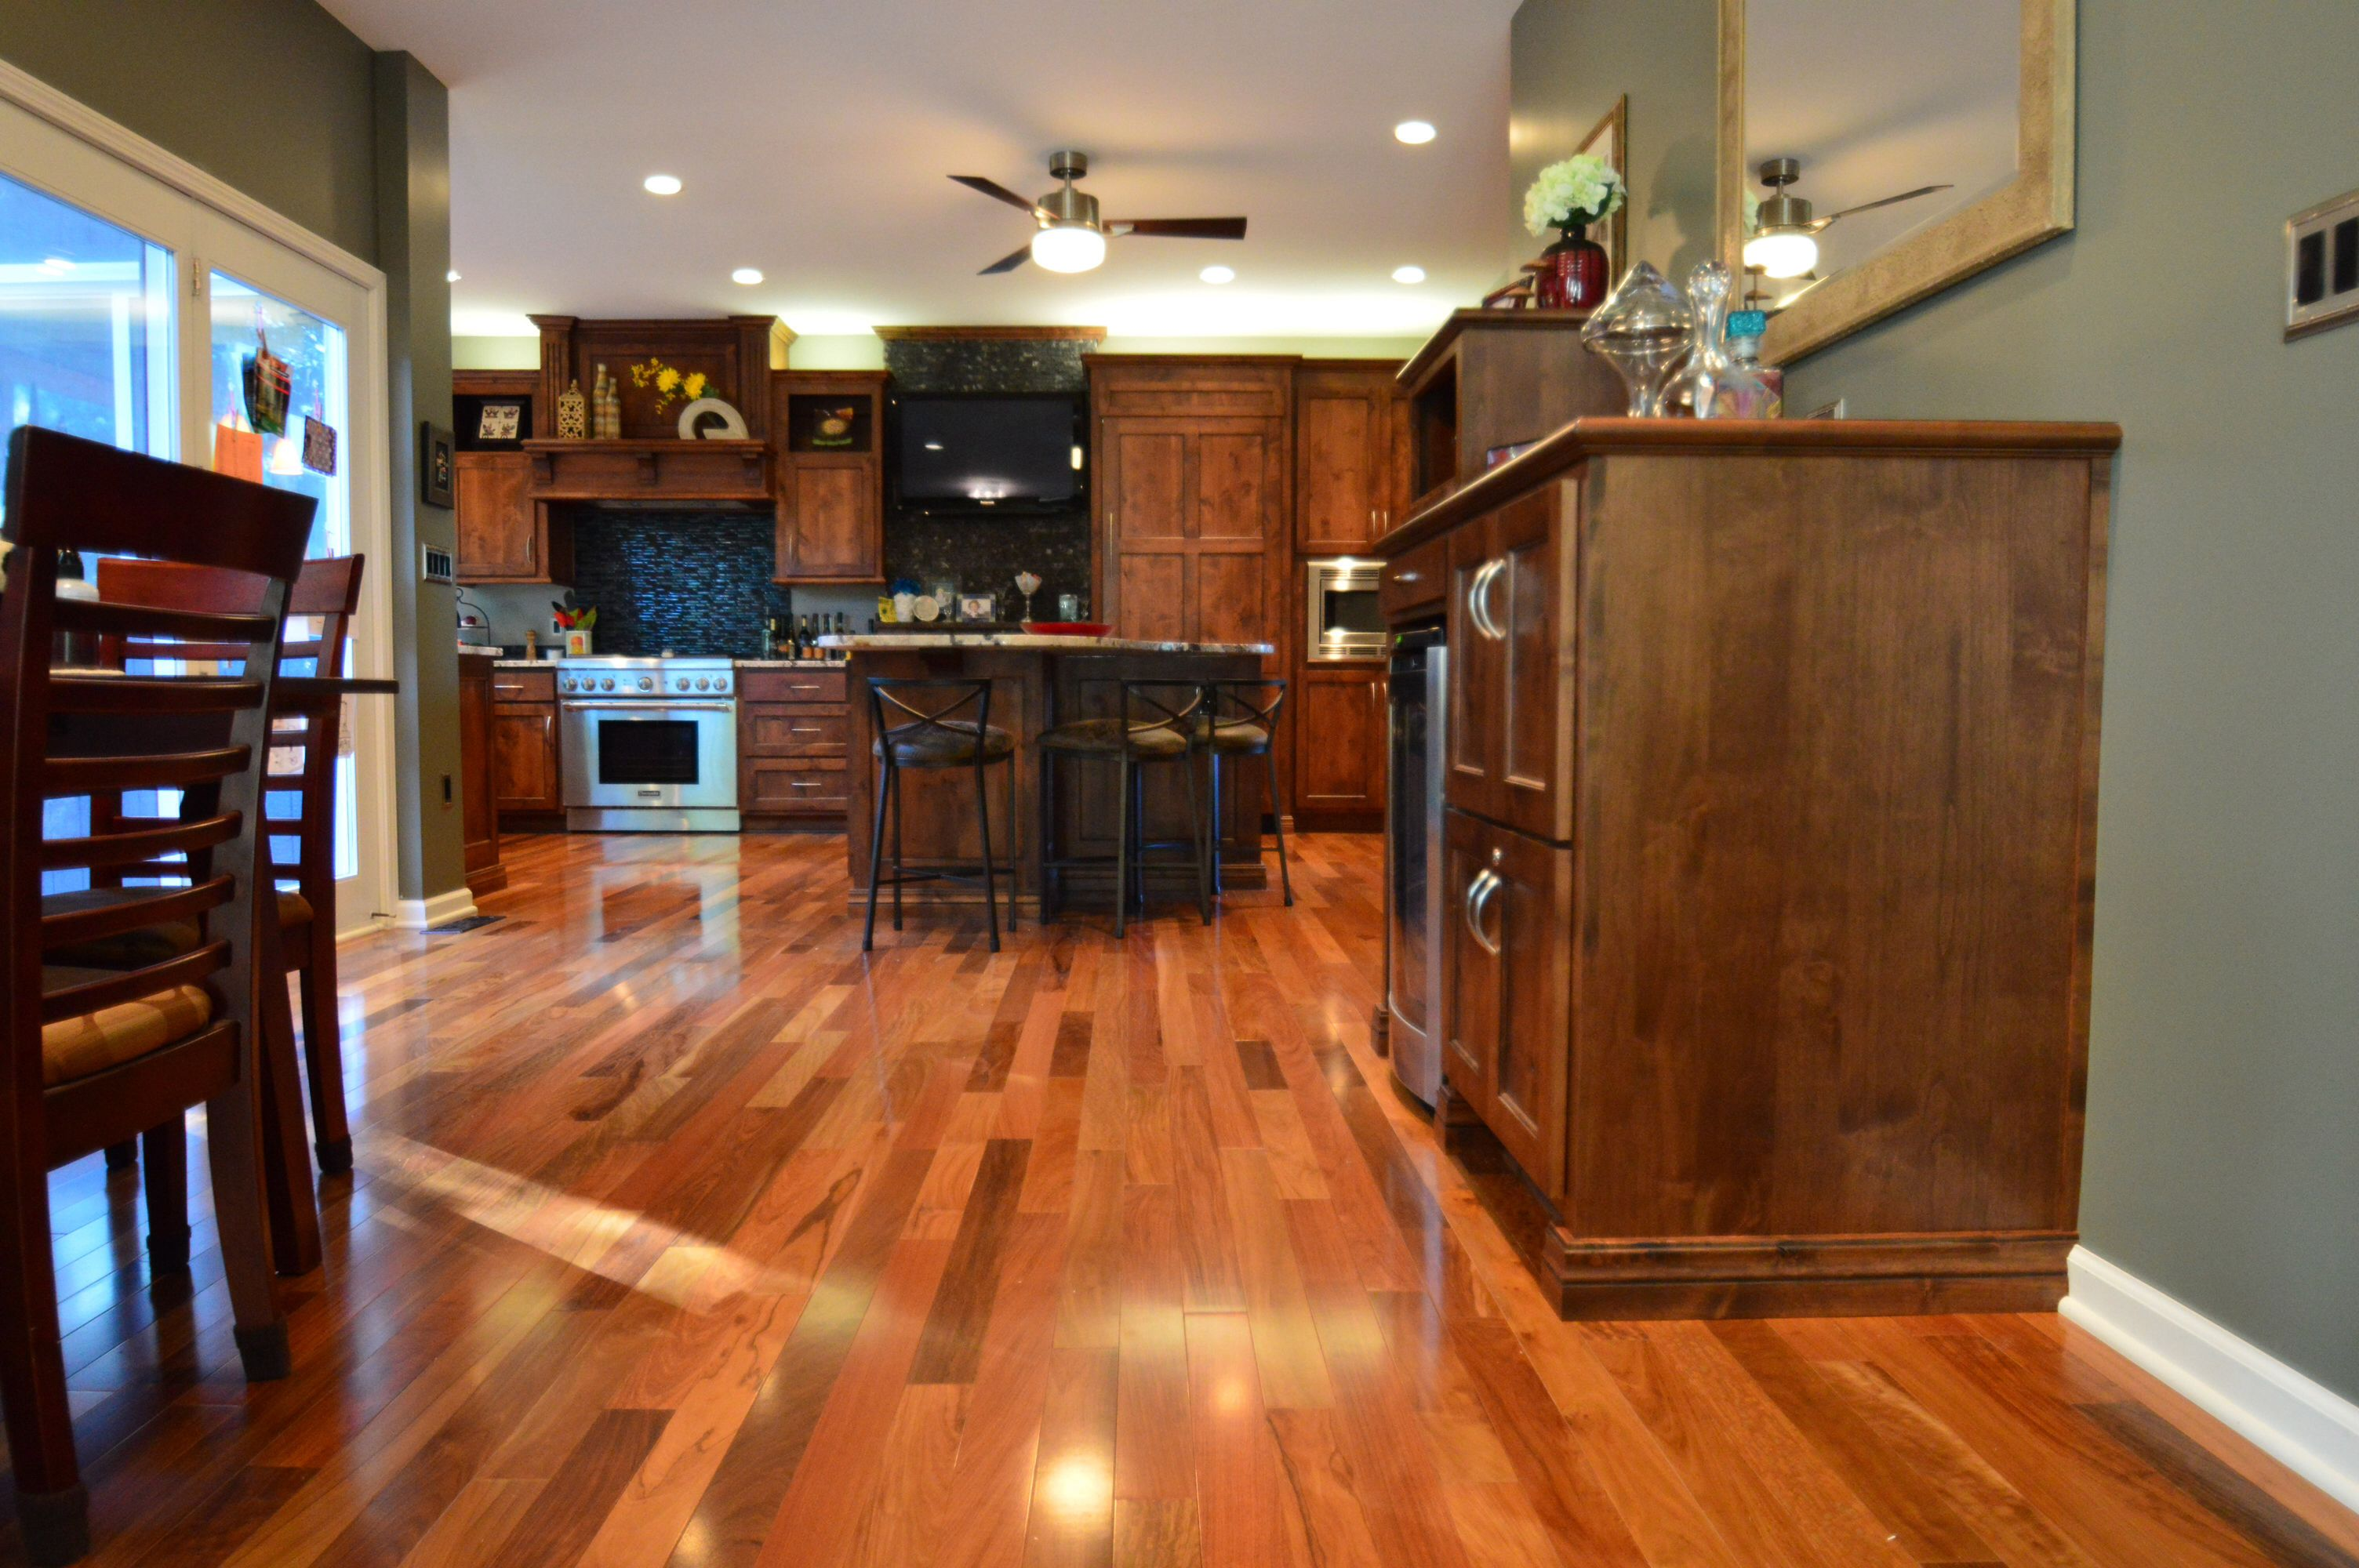 Brazilian Walnut Floors With Knotty Alder Cabinets